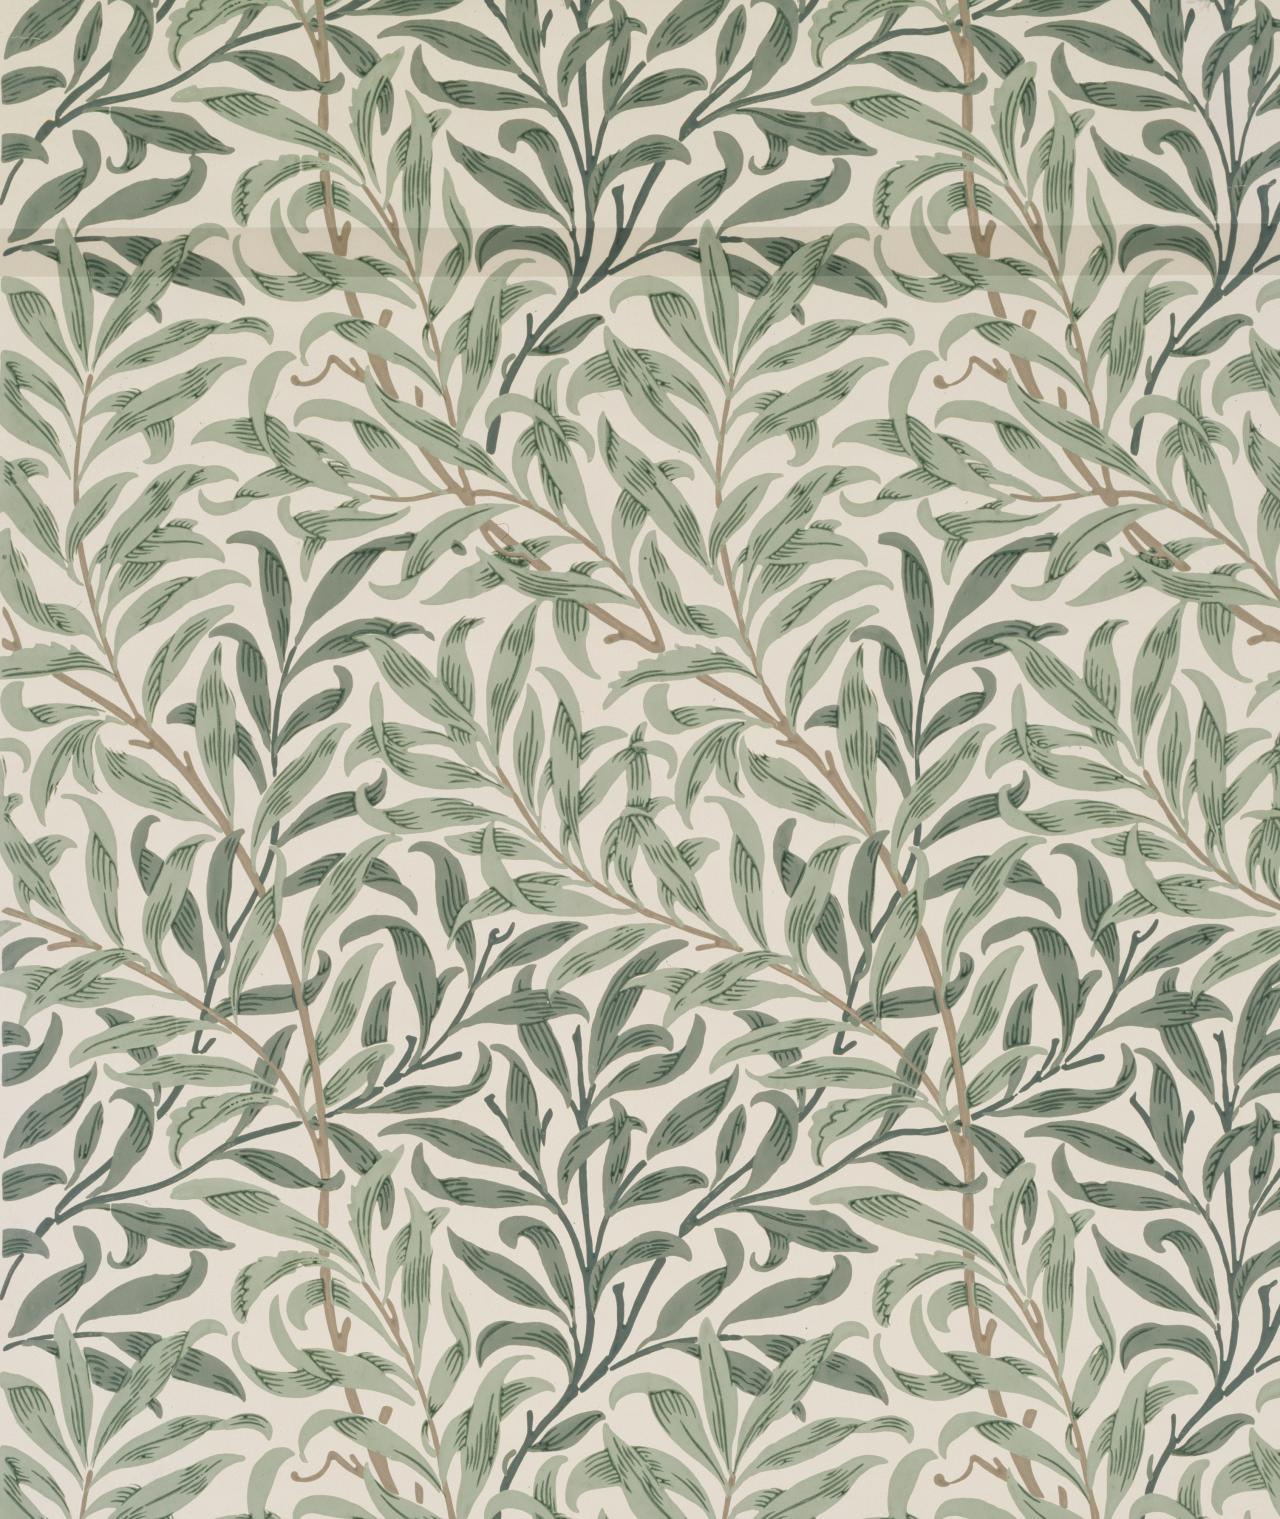 Willow Bough Wallpaper